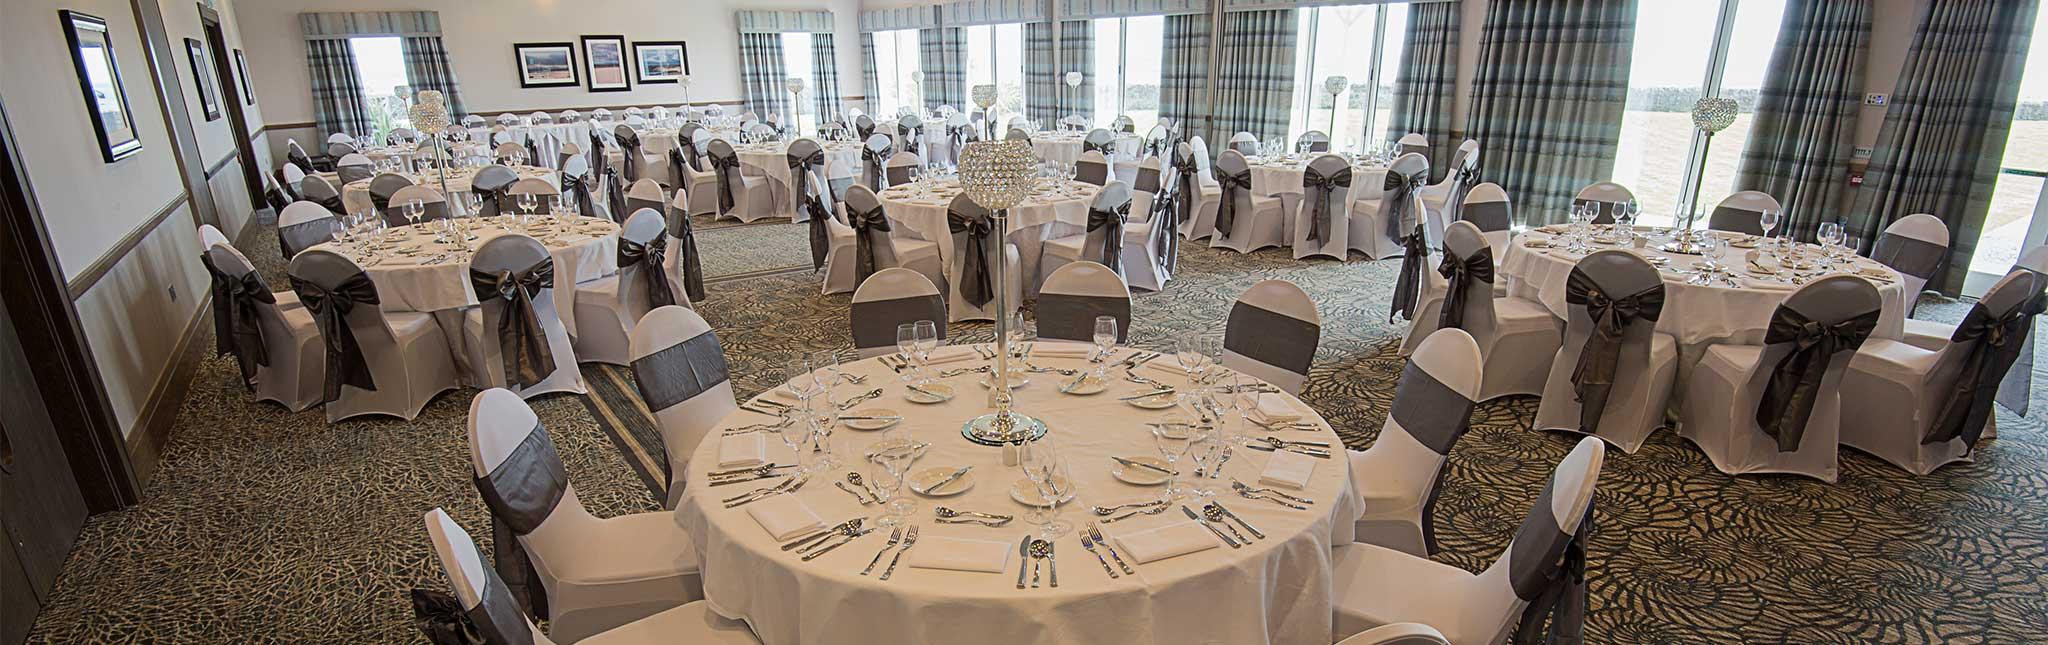 Wedding Venue Ayrshire West Kilbride